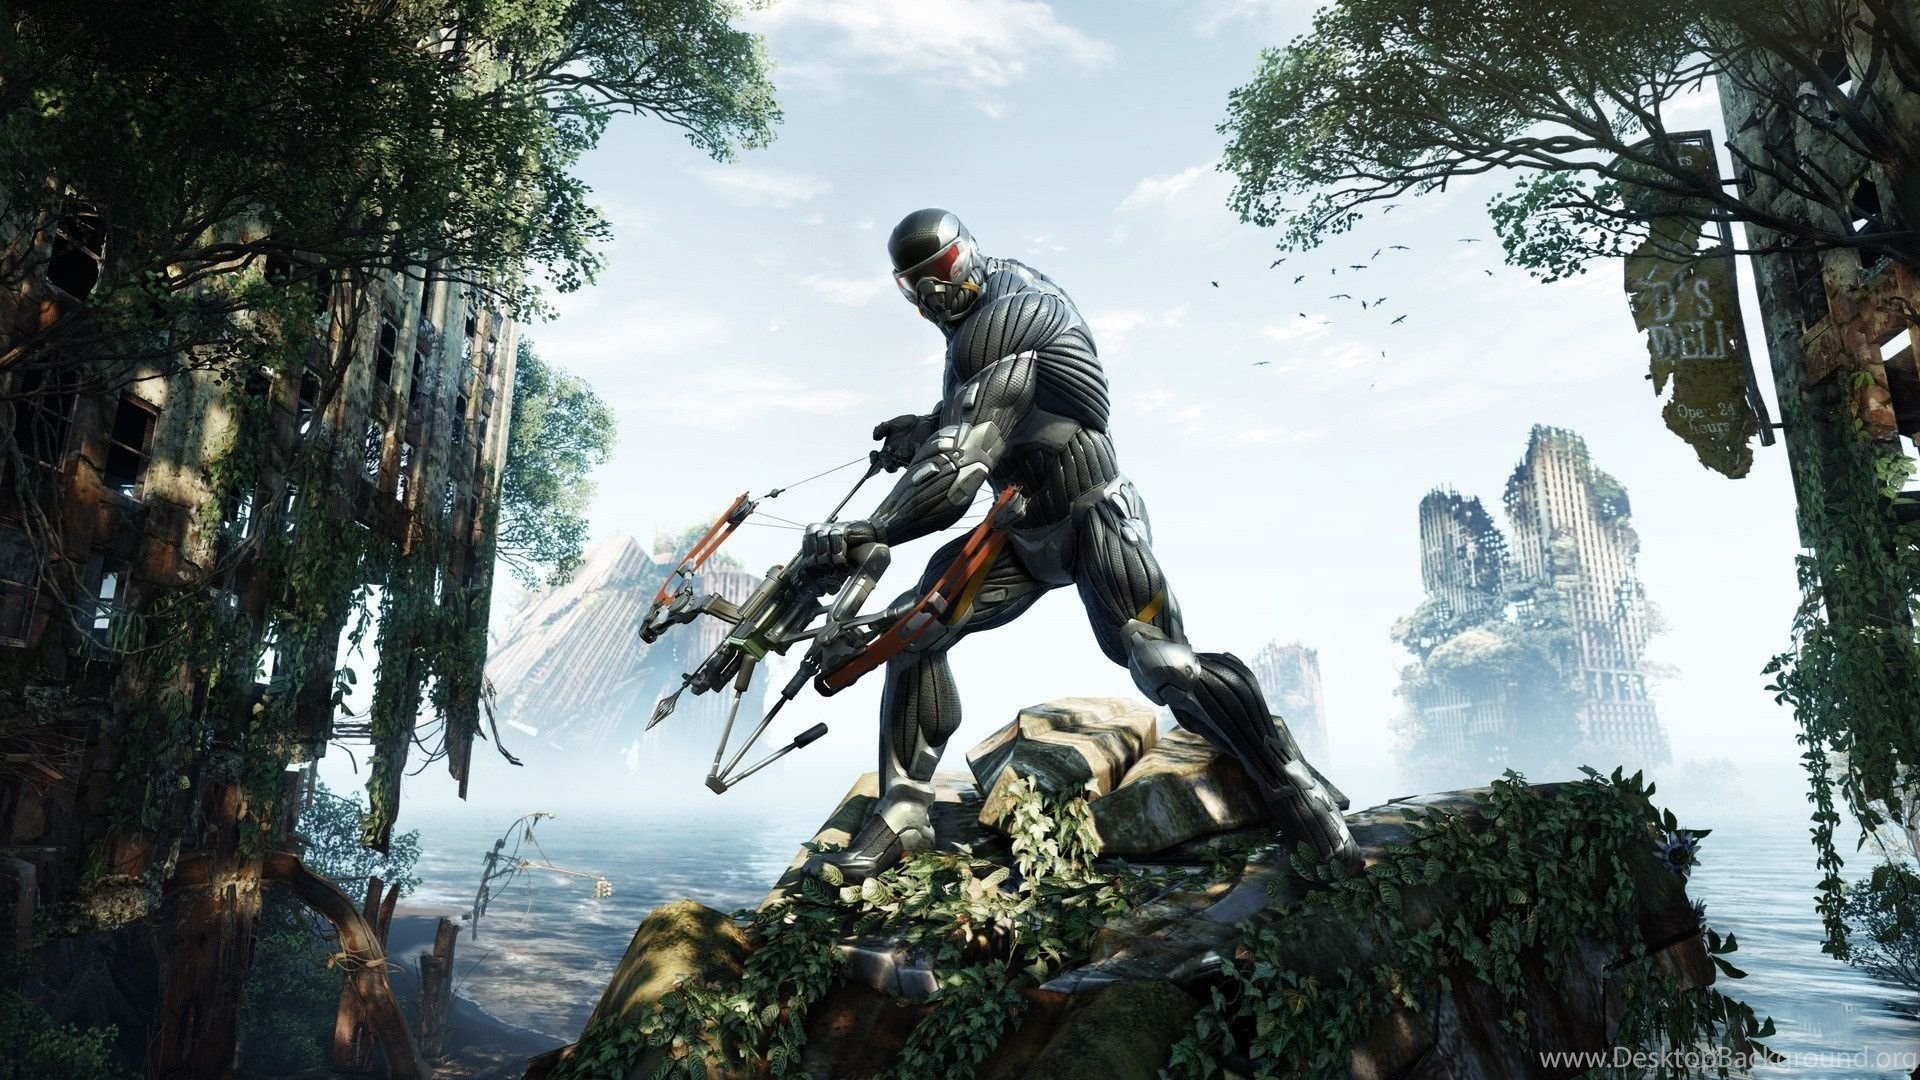 Beautiful Games Wallpapers Hd 1080p Desktop Background